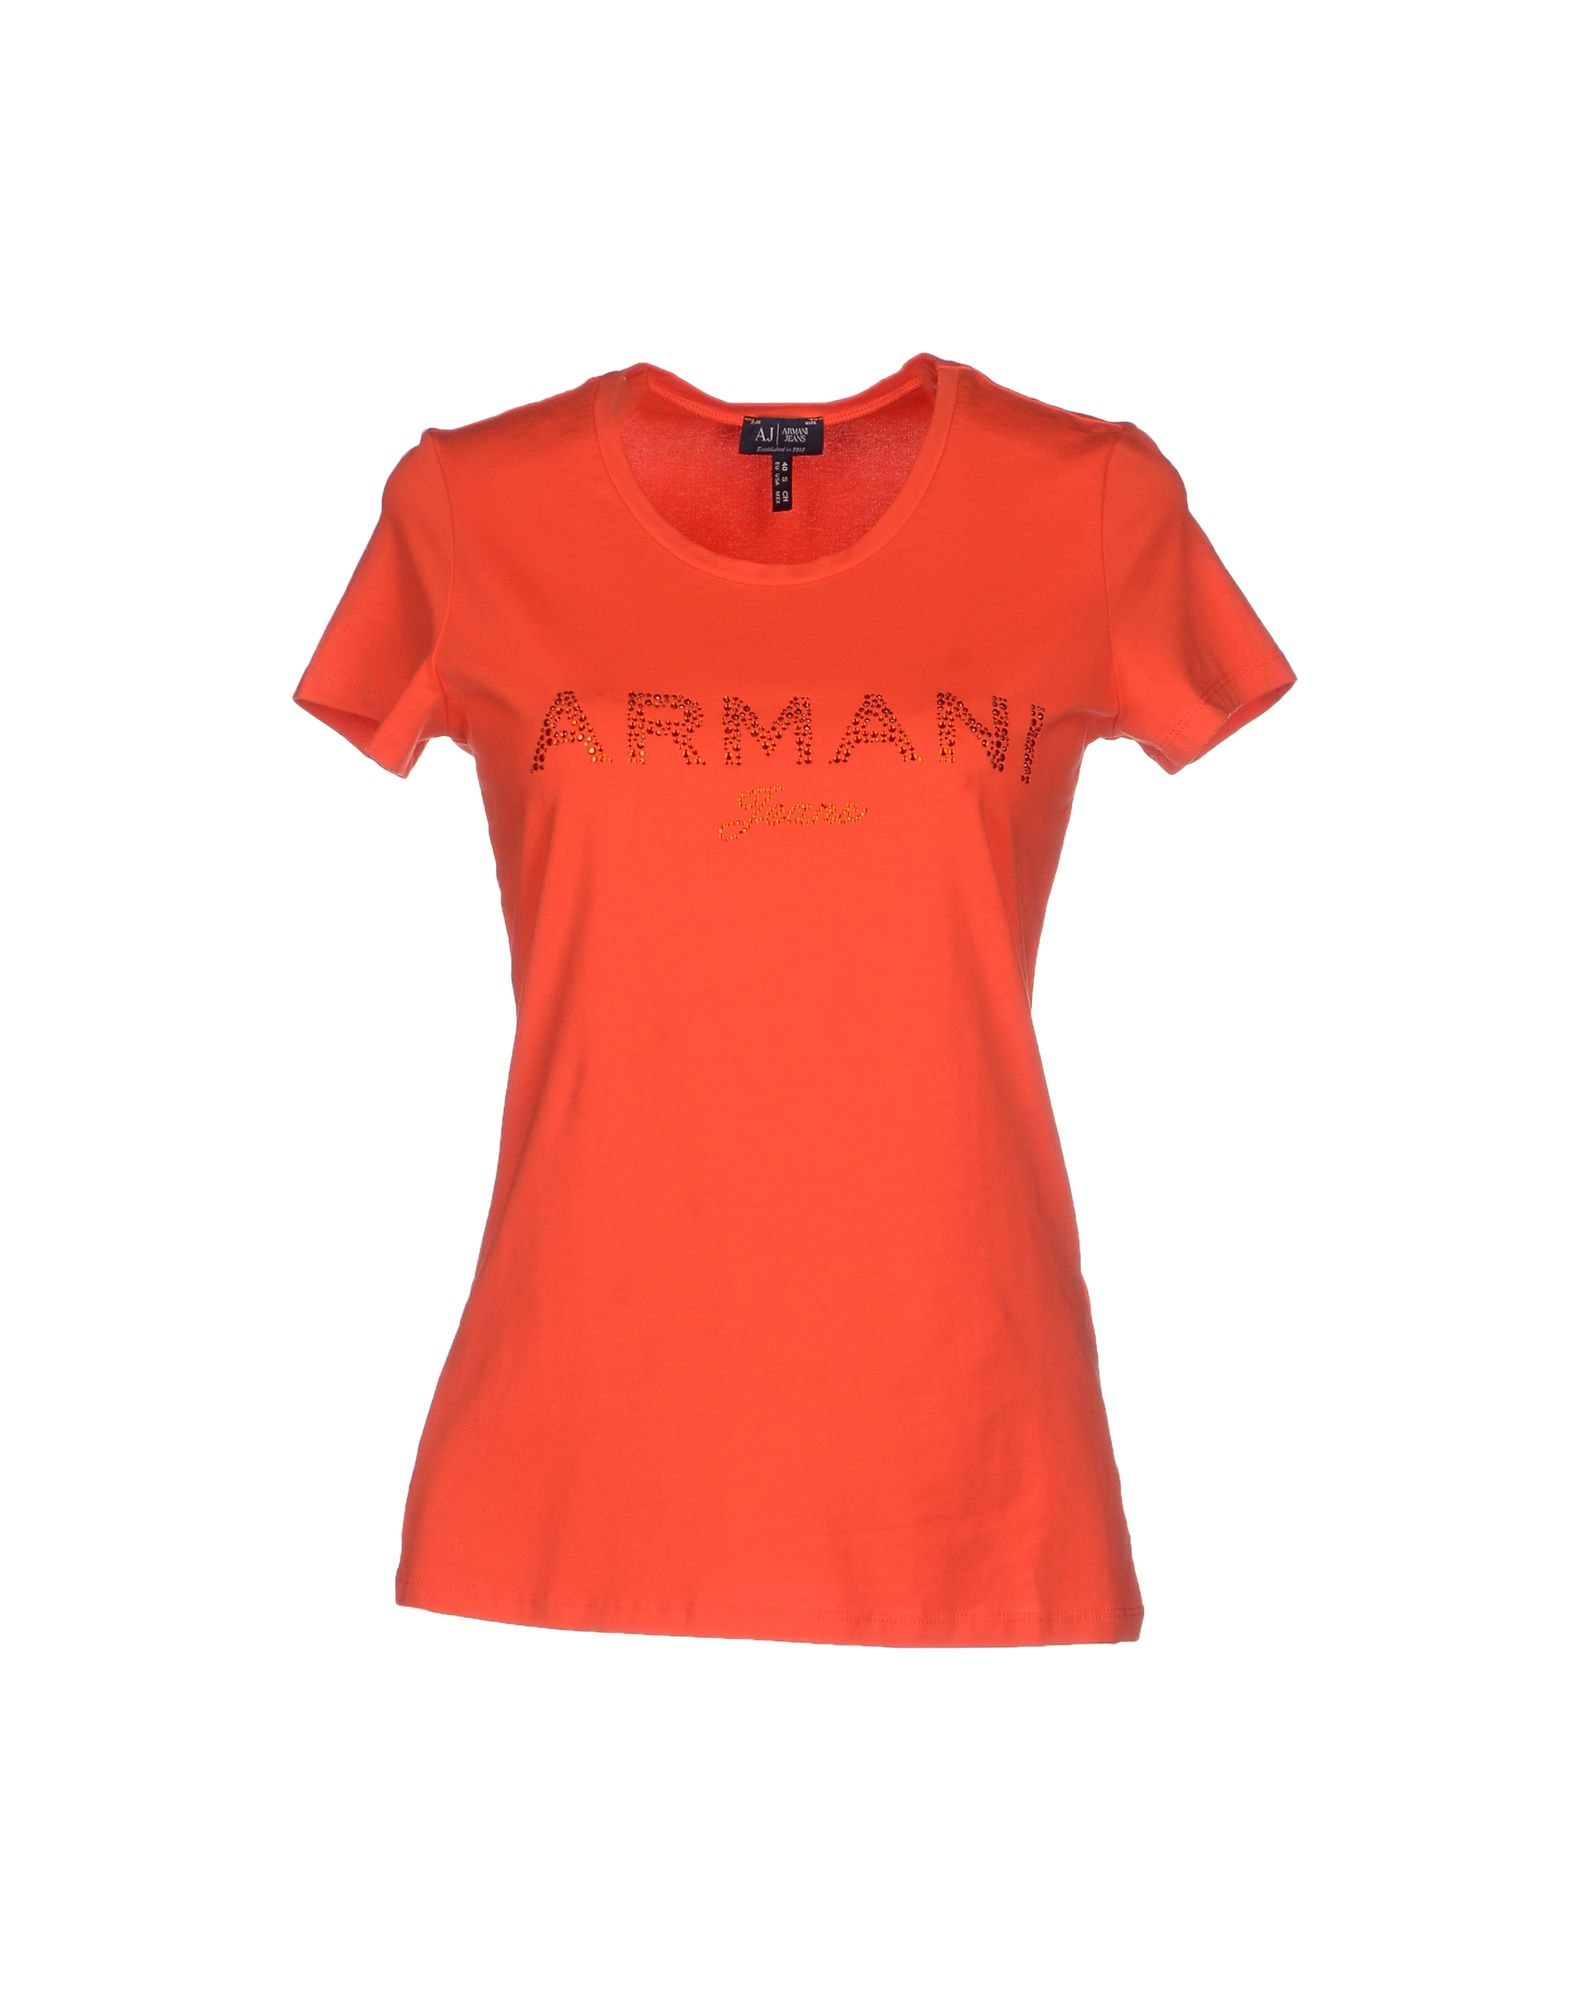 armani jeans t shirt in orange lyst. Black Bedroom Furniture Sets. Home Design Ideas